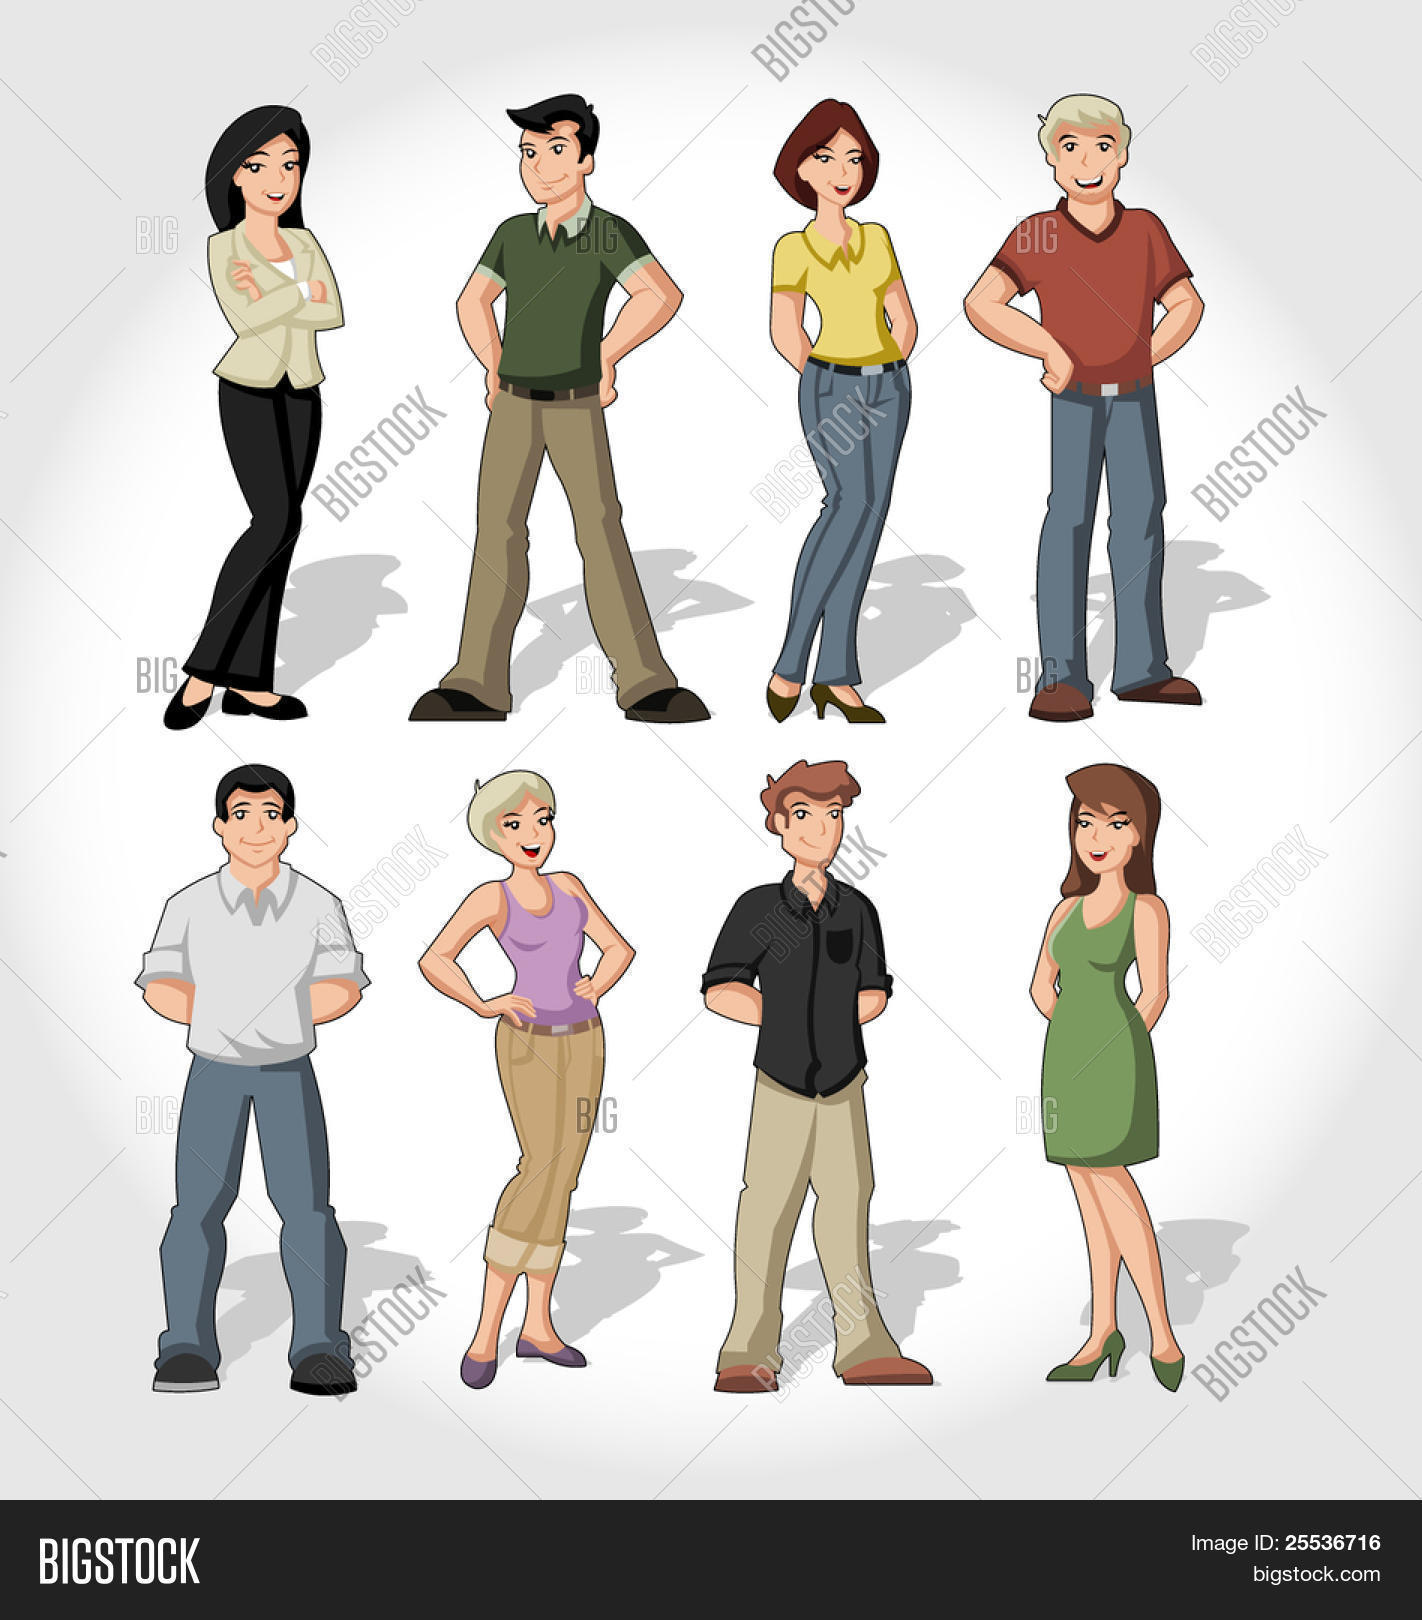 Grupo de gente conociendose dibujos [PUNIQRANDLINE-(au-dating-names.txt) 31